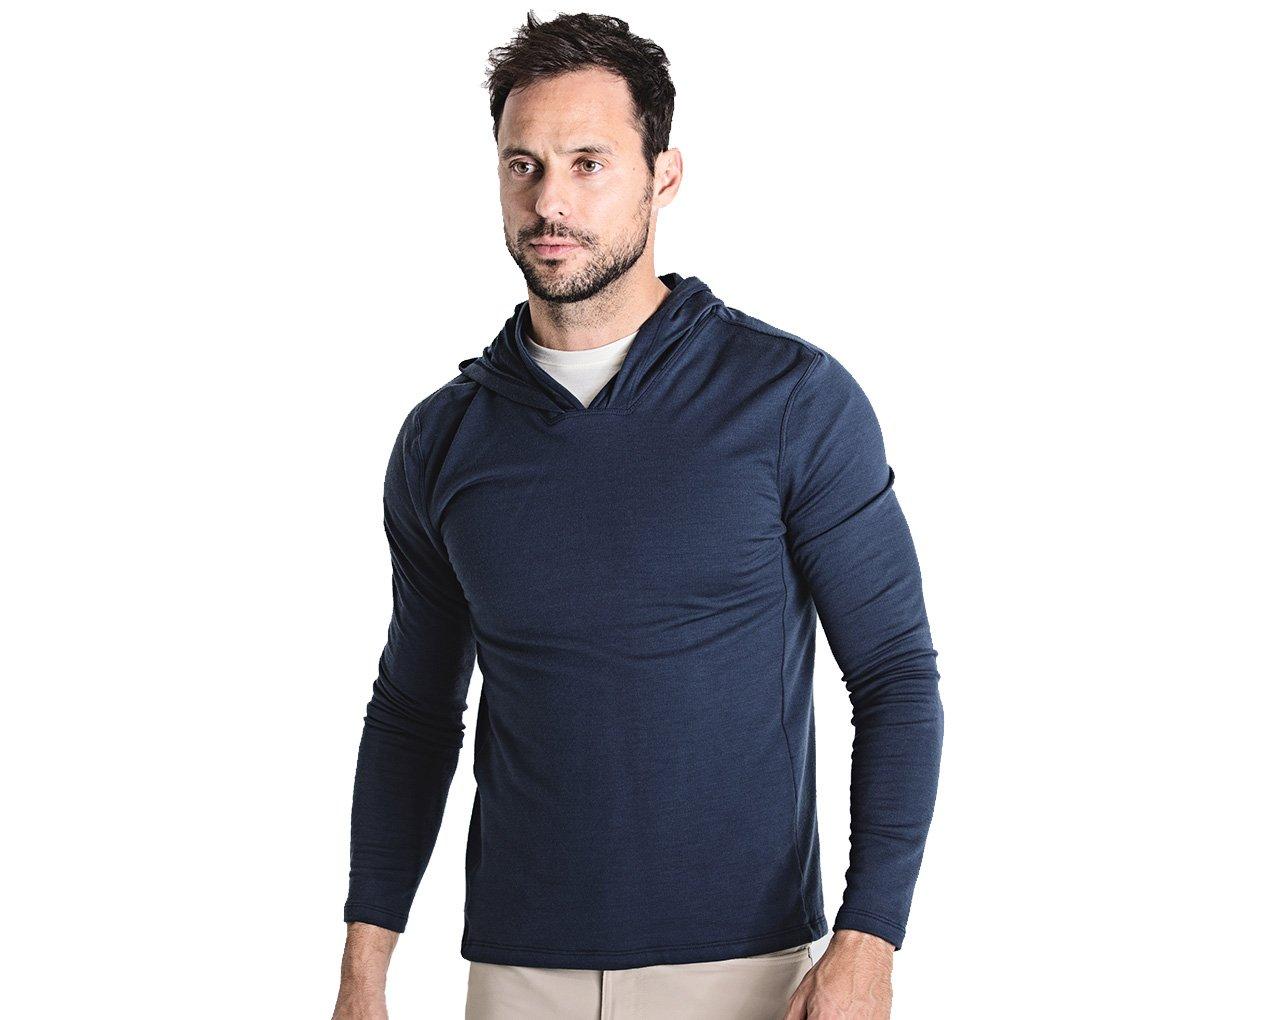 OLIVERS Apparel, Mens Merino Wool Performance Porter Hoodie. Odor Resistant, Water Repellent, and Temperature Regulating (Navy, Medium)